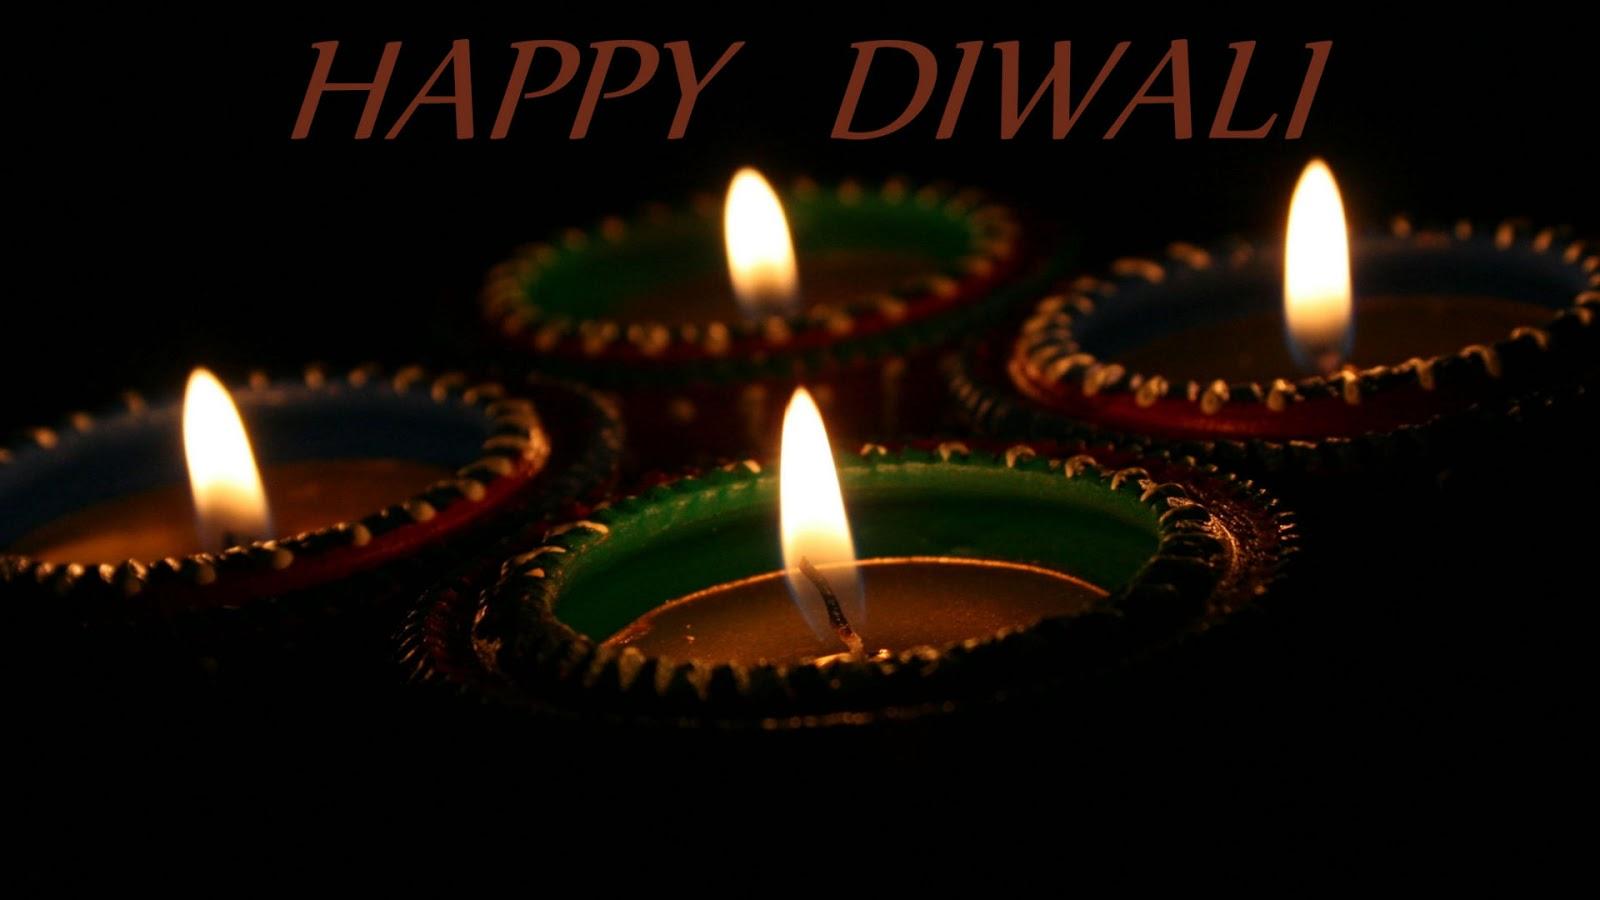 Diwali Hd Wallpapers In Hd,photos,image,greetings